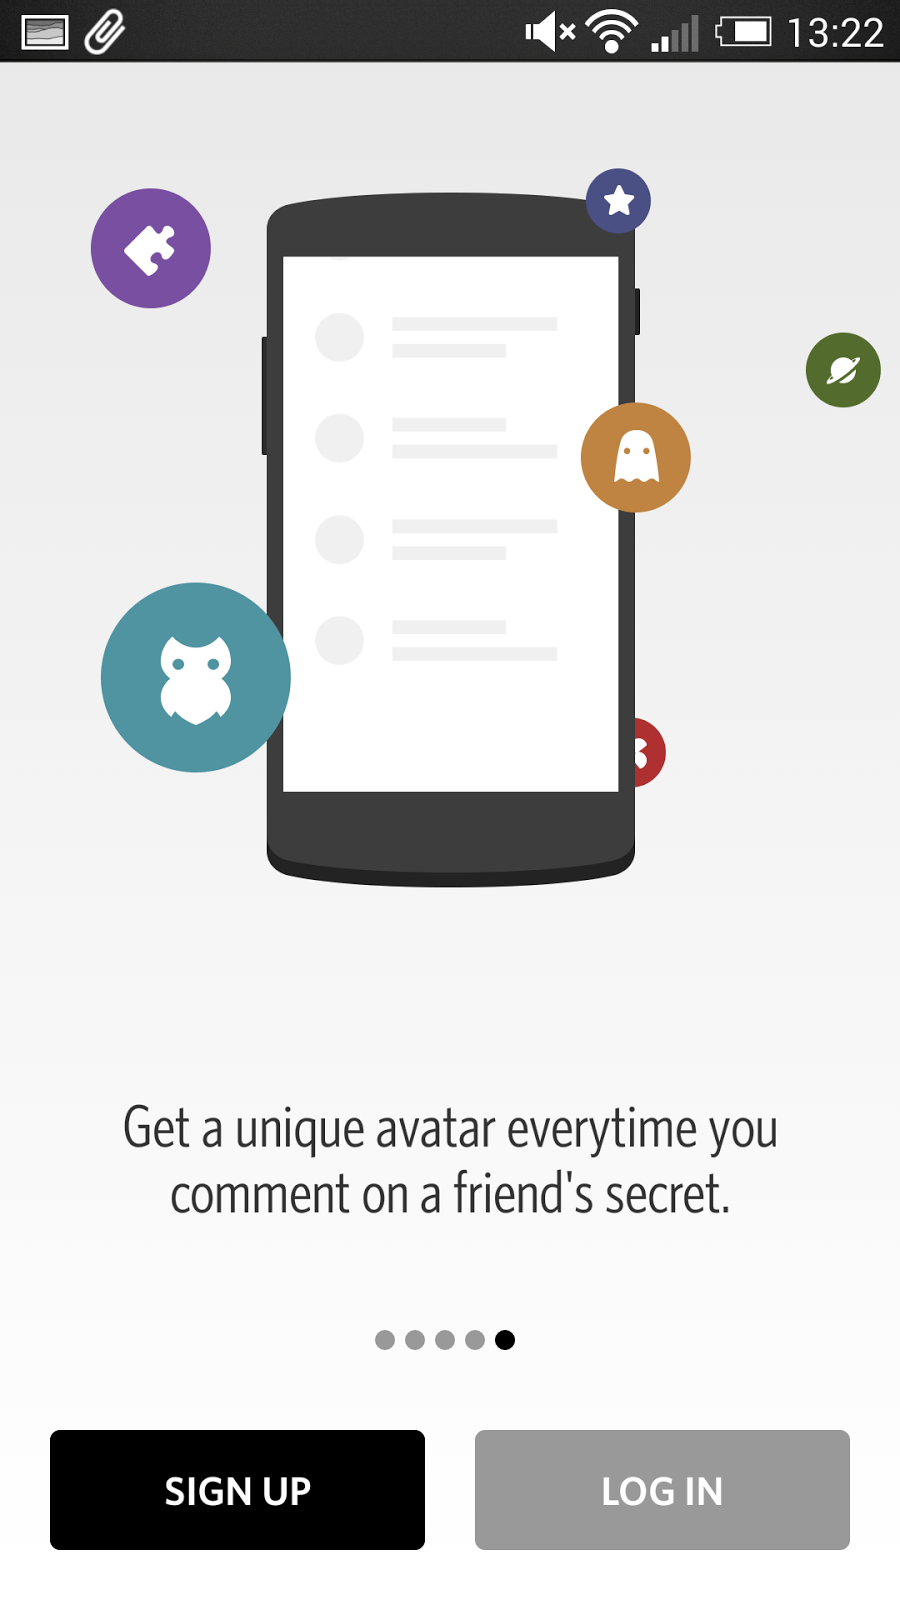 Secret 解除分享焦慮的社交 App ,對朋友匿名寫真心話 secret-04